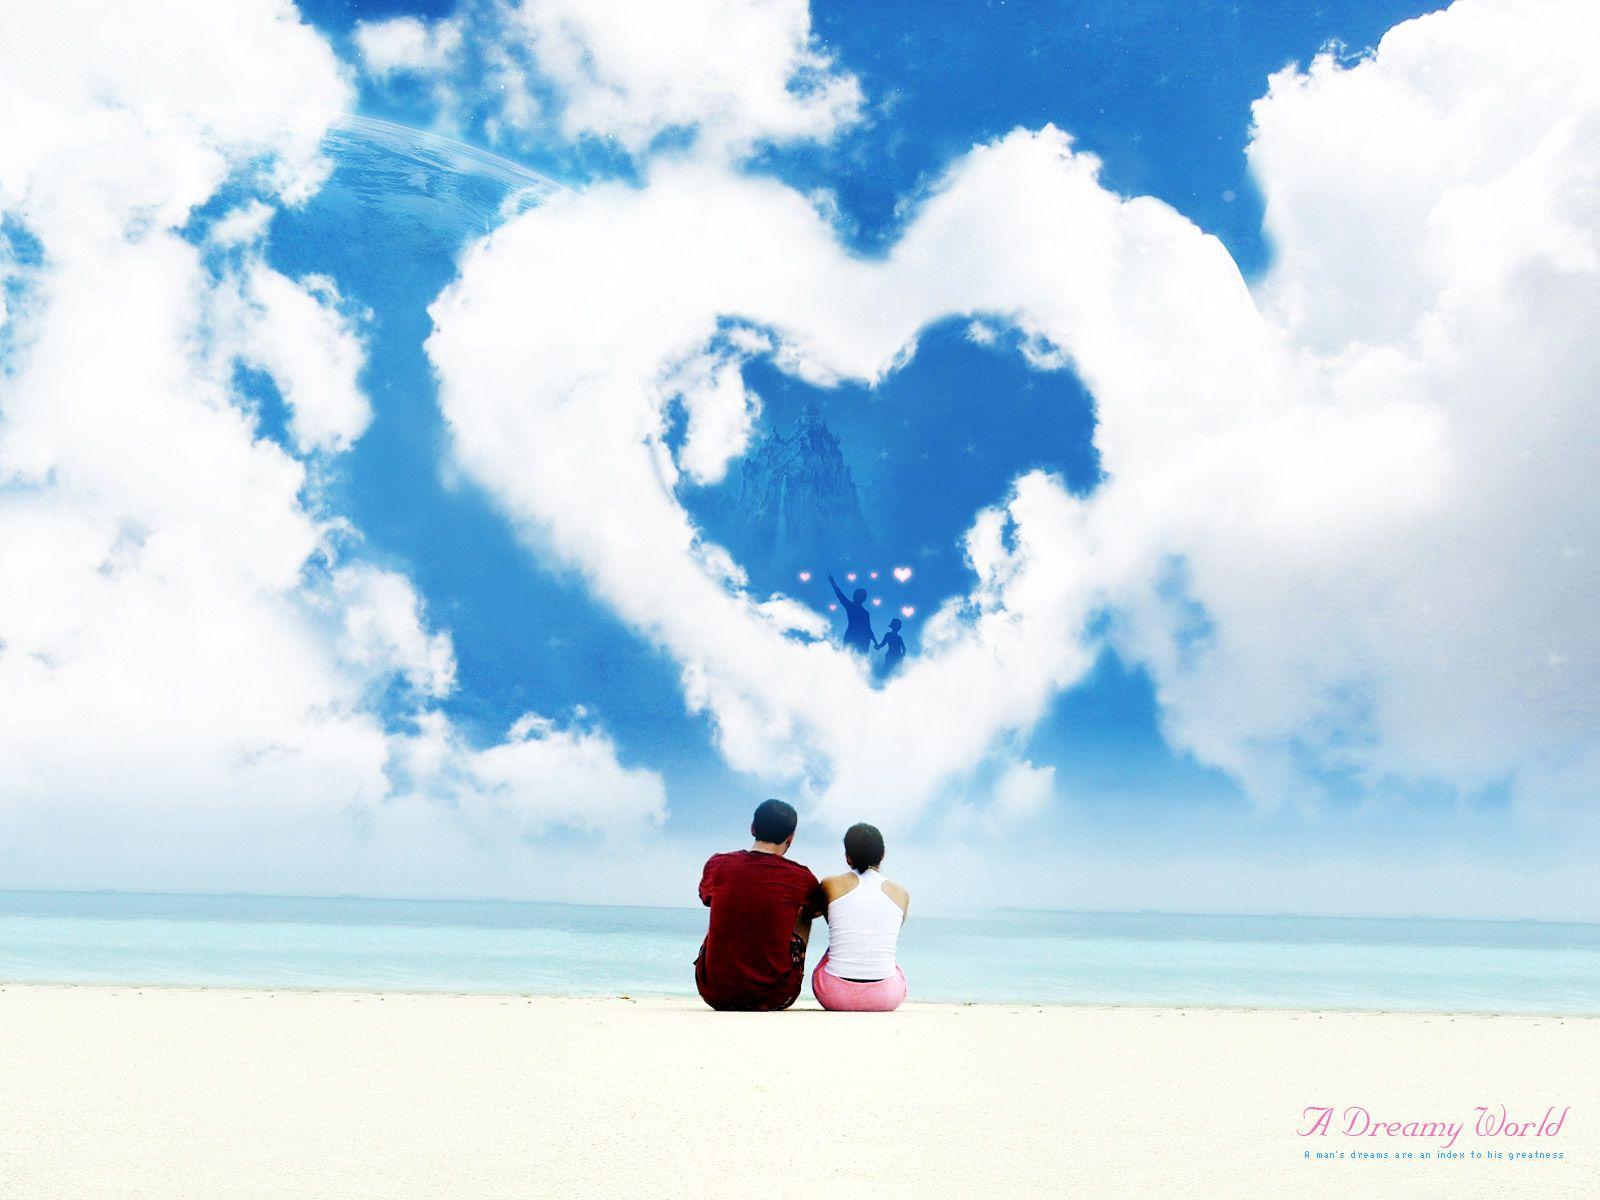 30 Love Wallpaper By Waltraud Kincey Freshwall